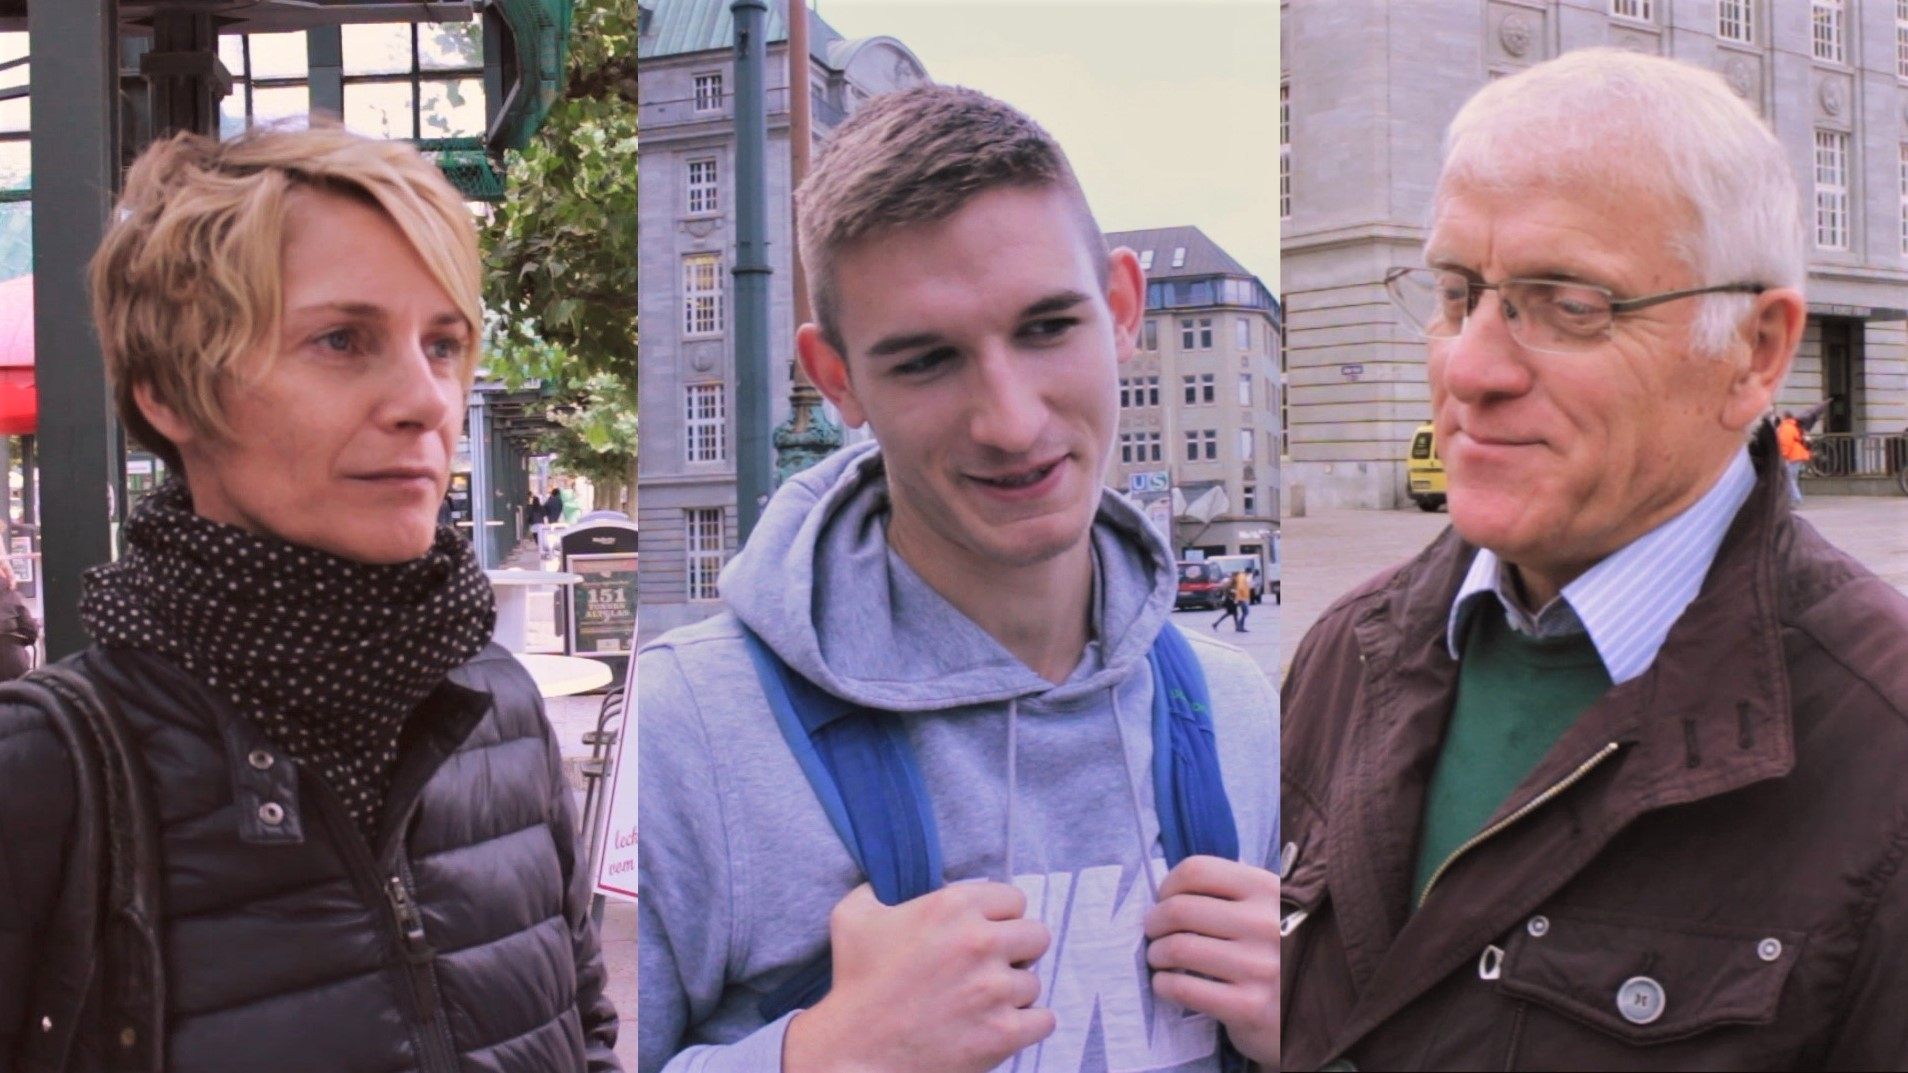 Der große dbate Wähler-Check zur Bundestagswahl